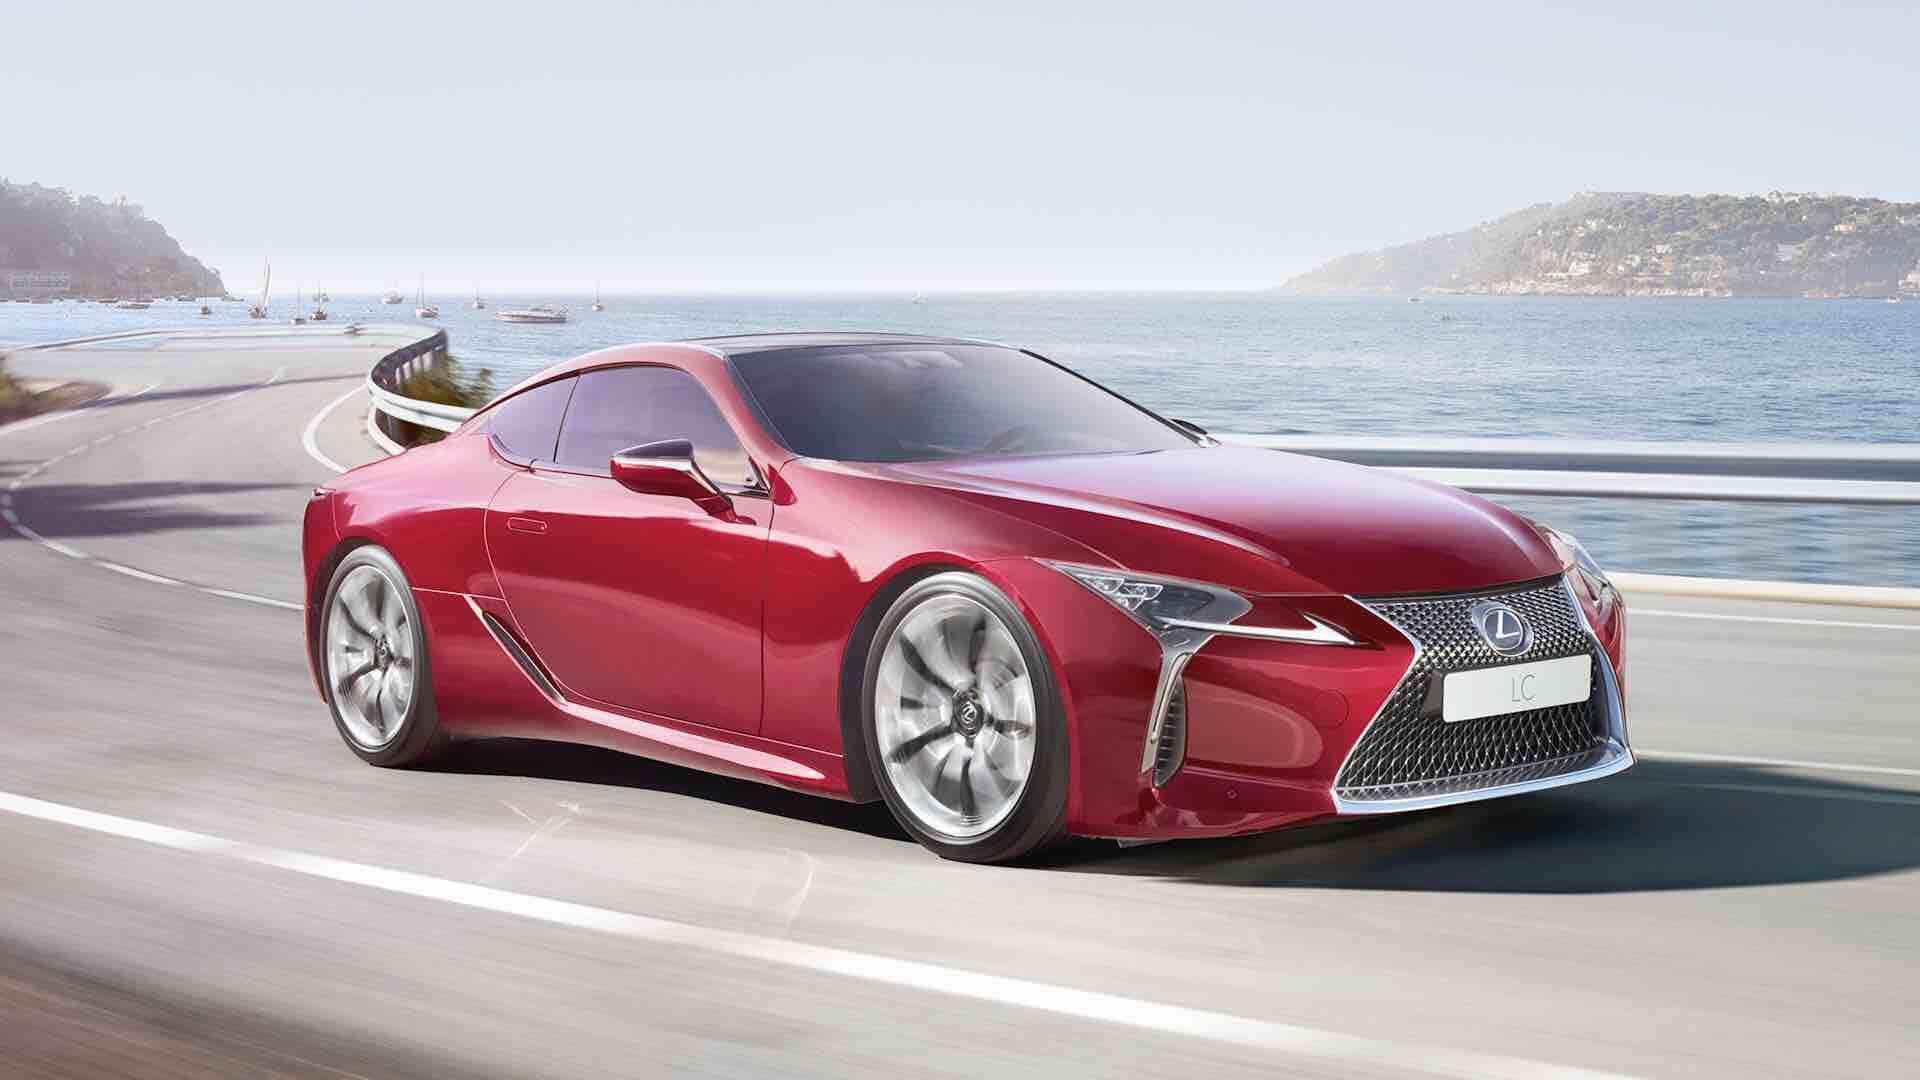 SWOT analysis of Lexus